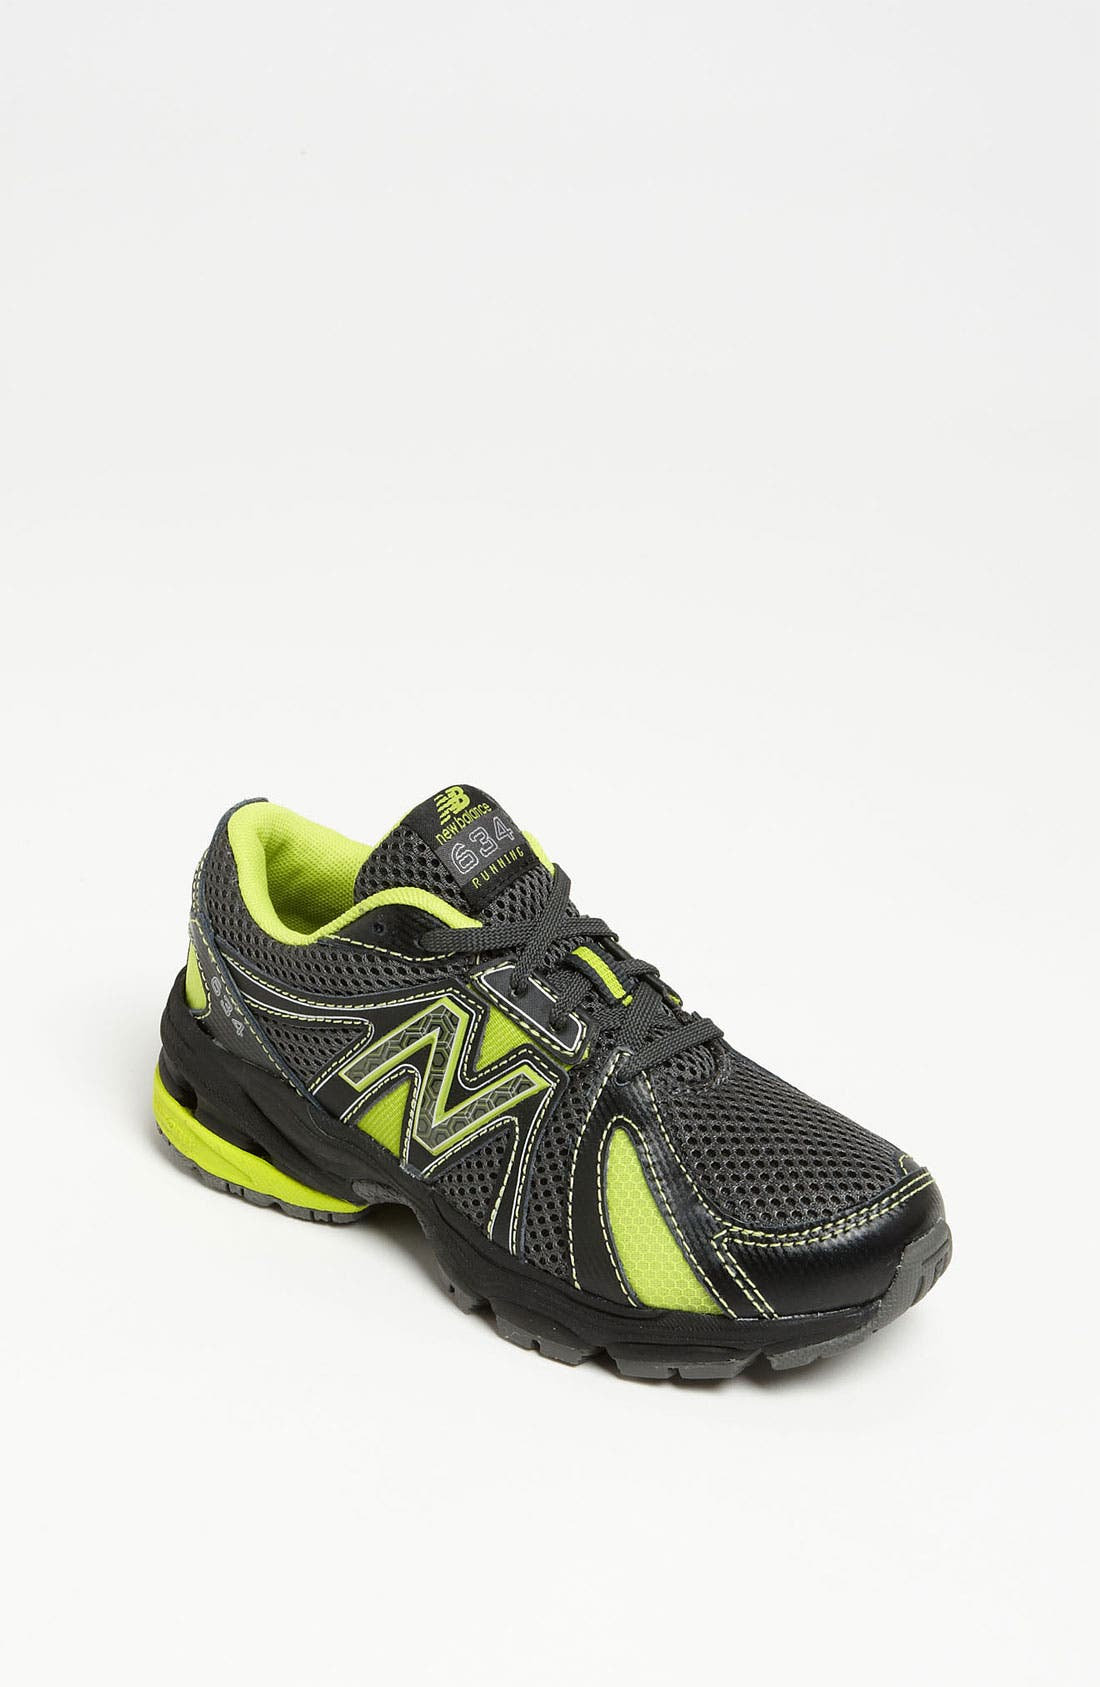 Alternate Image 1 Selected - New Balance '634' Running Shoe (Toddler, Little Kid & Big Kid)